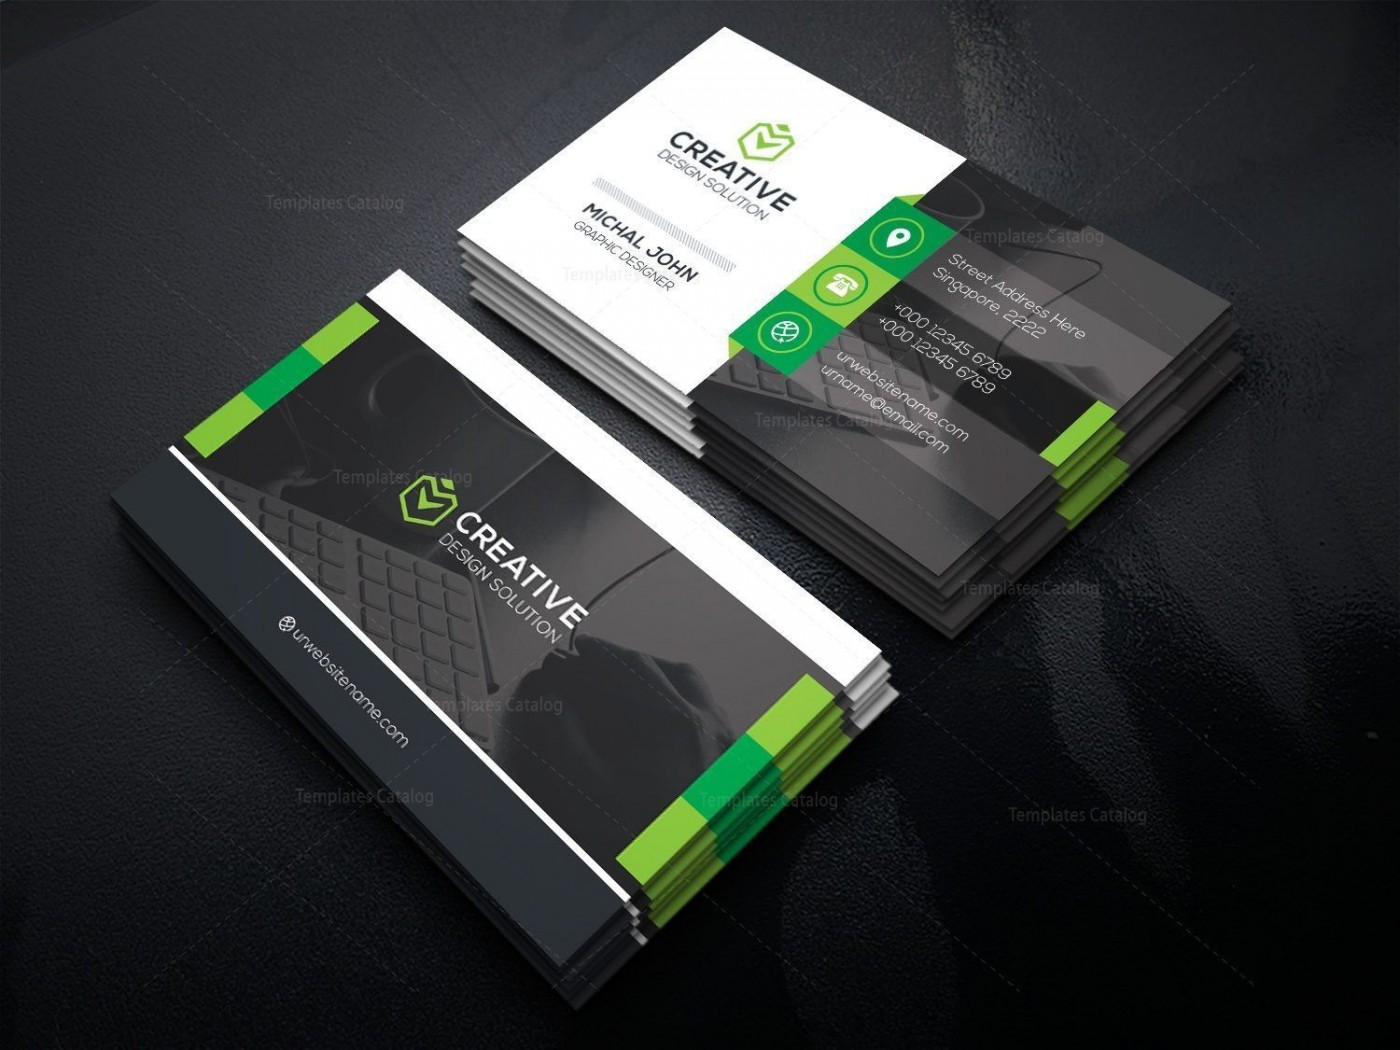 003 Surprising M Office Busines Card Template Image  Microsoft 2010 2003 20071400